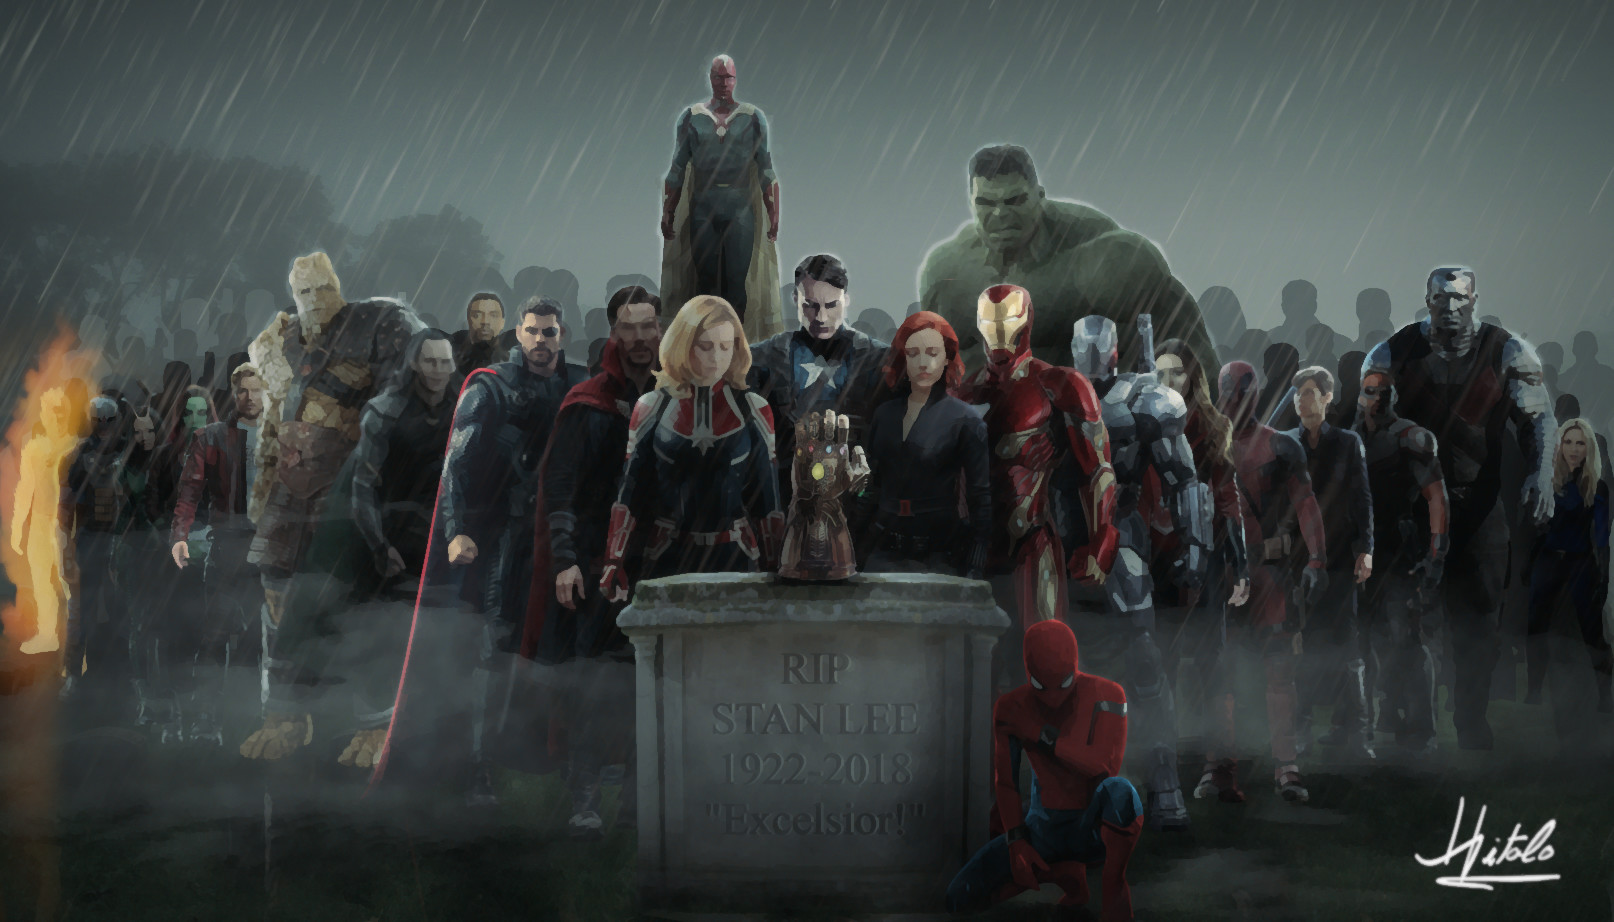 Stan Lee Tribute Wallpaper By Hitalo Fred Captain America